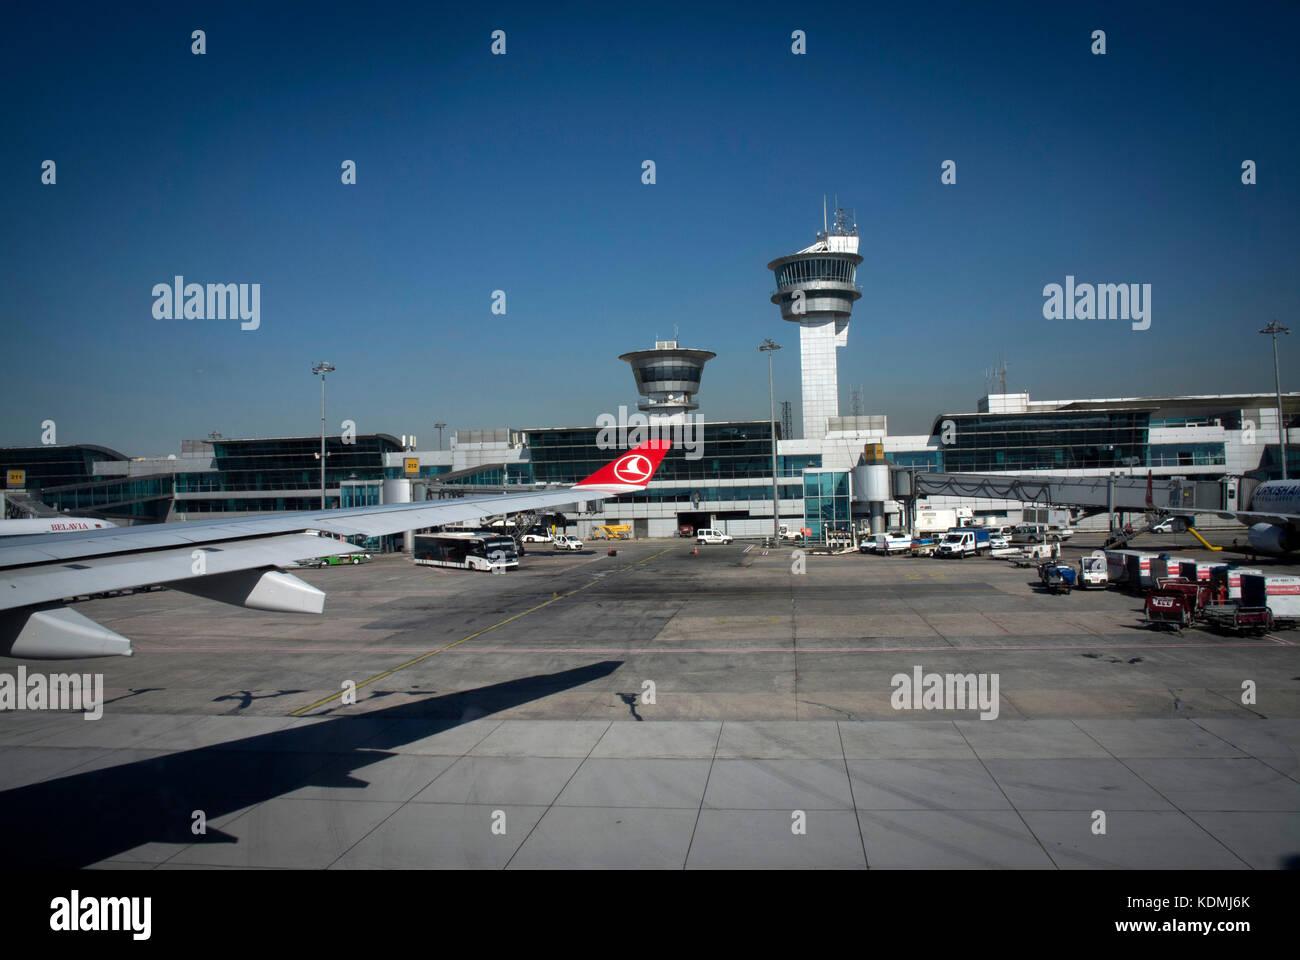 L'aéroport d'Istanbul, Turquie Photo Stock